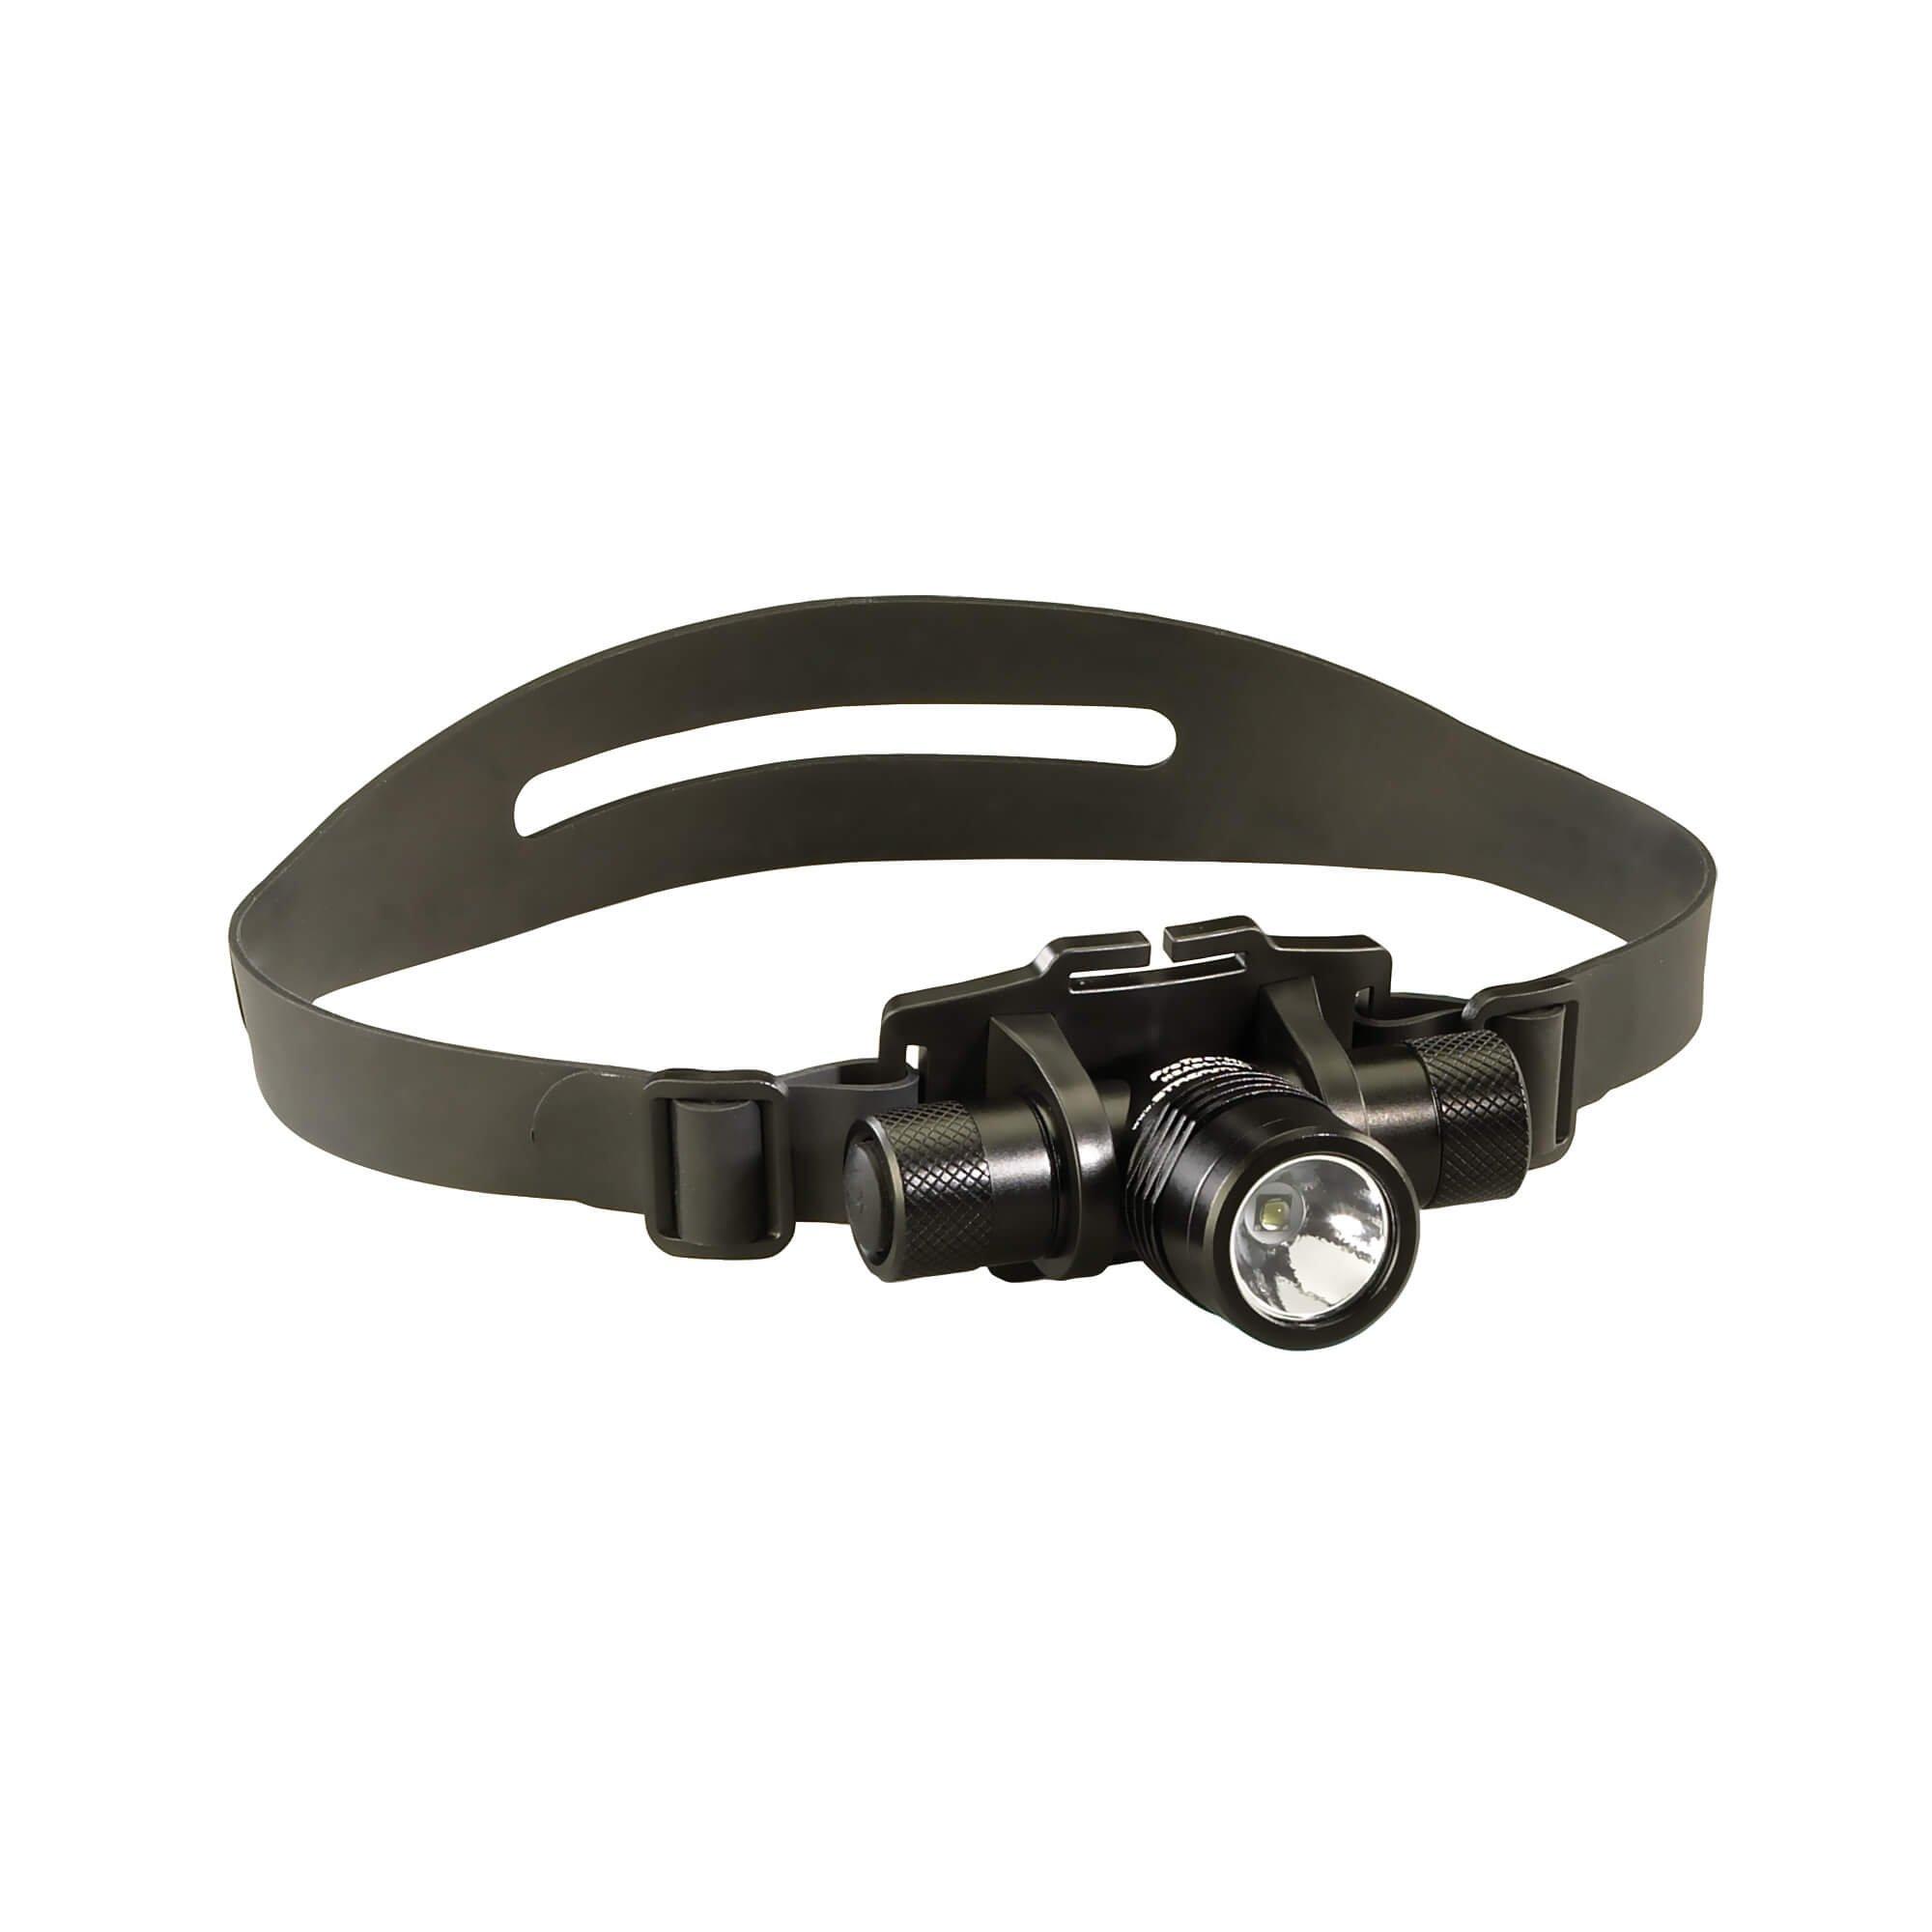 Streamlight ProTac HL Headlamp 61304 by Streamlight